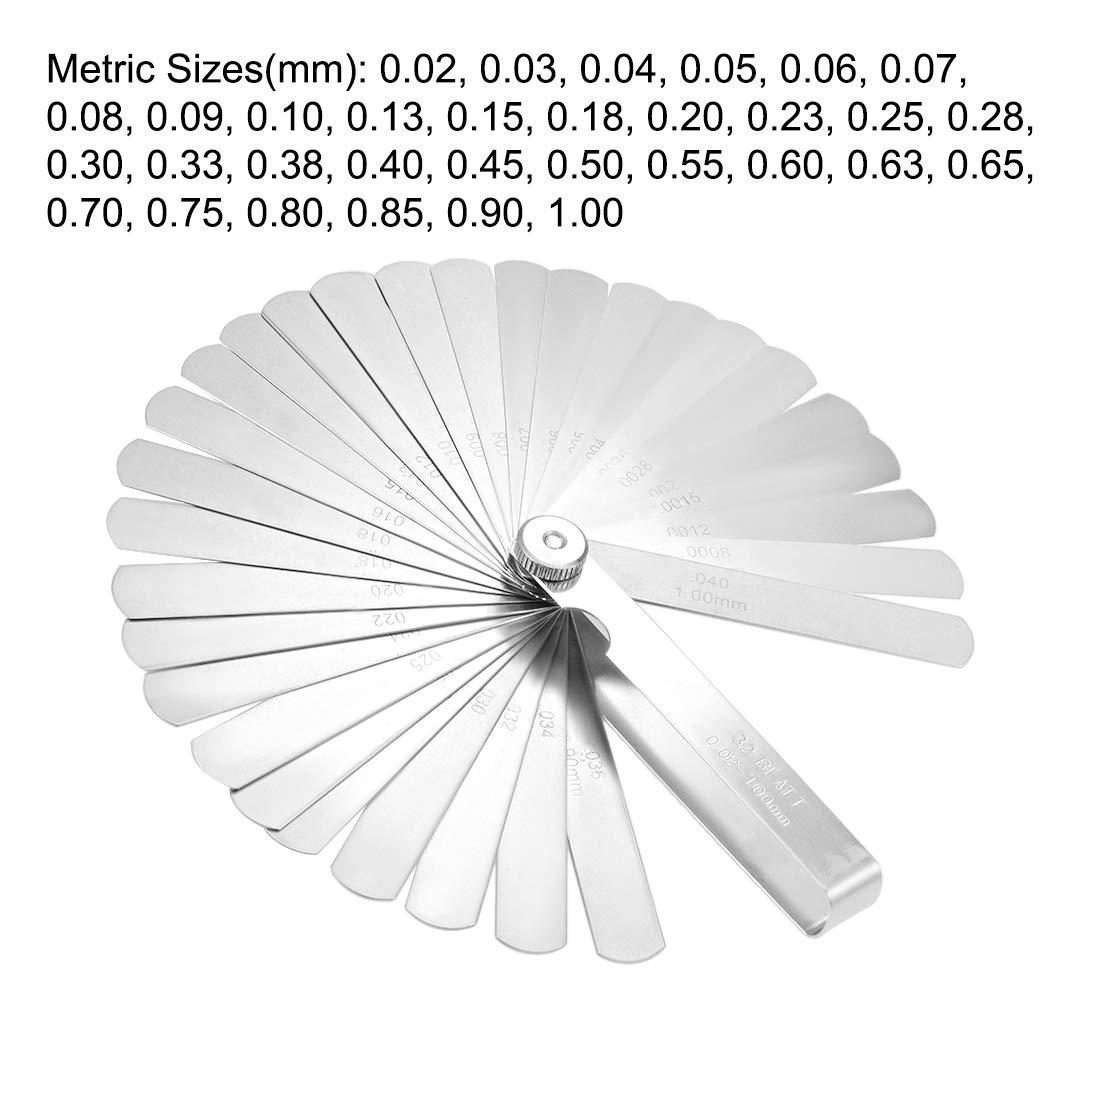 sourcing map Metric Thickness Feeler Gauge 0.05-1.00mm 16 Blades Mn Steel Measuring Tool for Gap Width